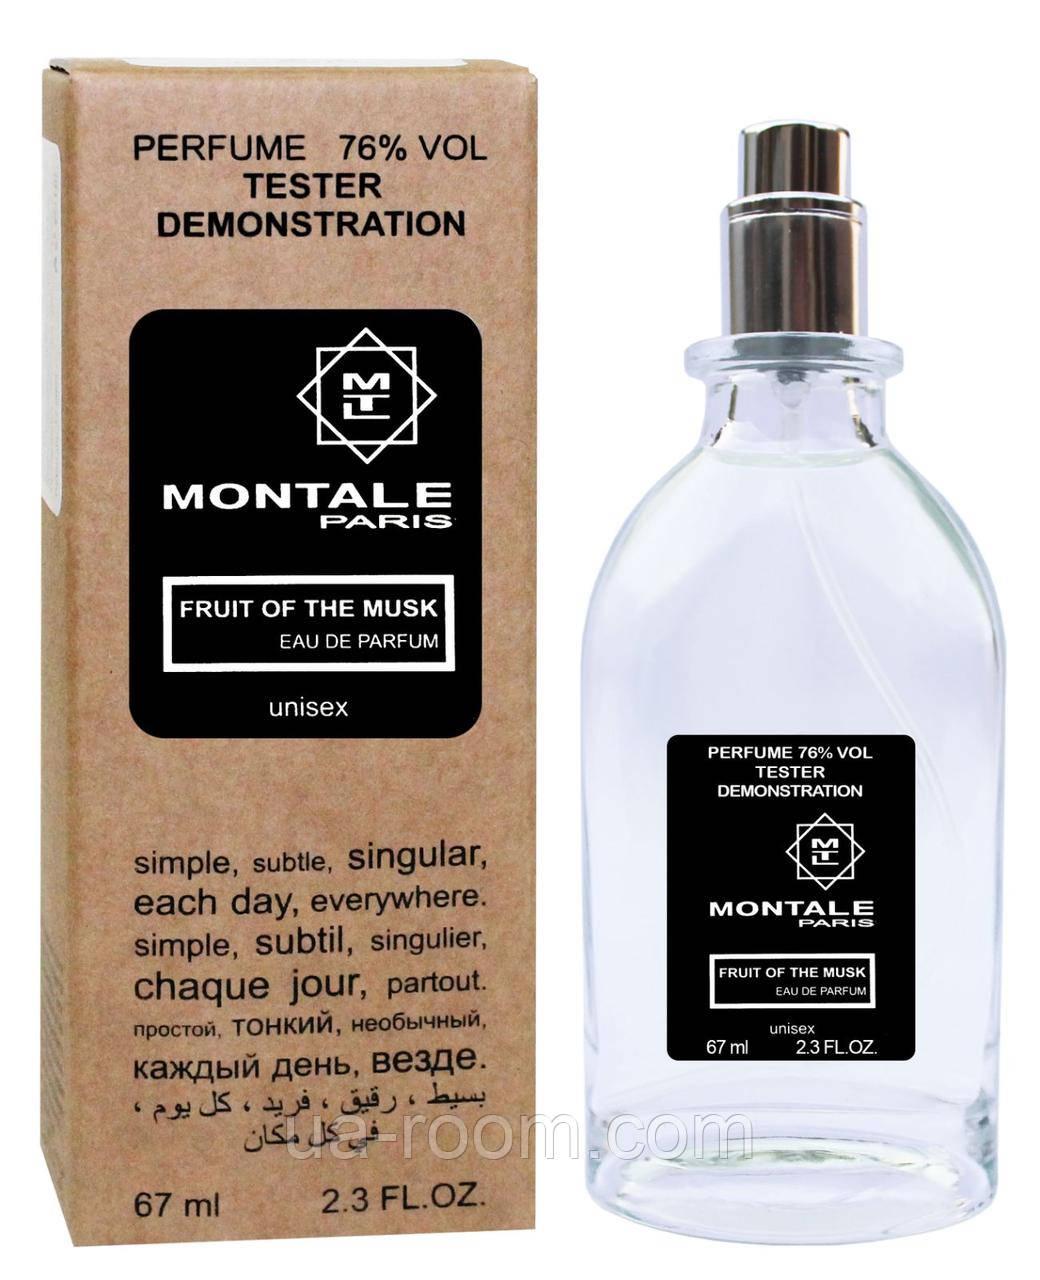 Тестер унисекс Montale Fruits of the Musk, 67 мл.